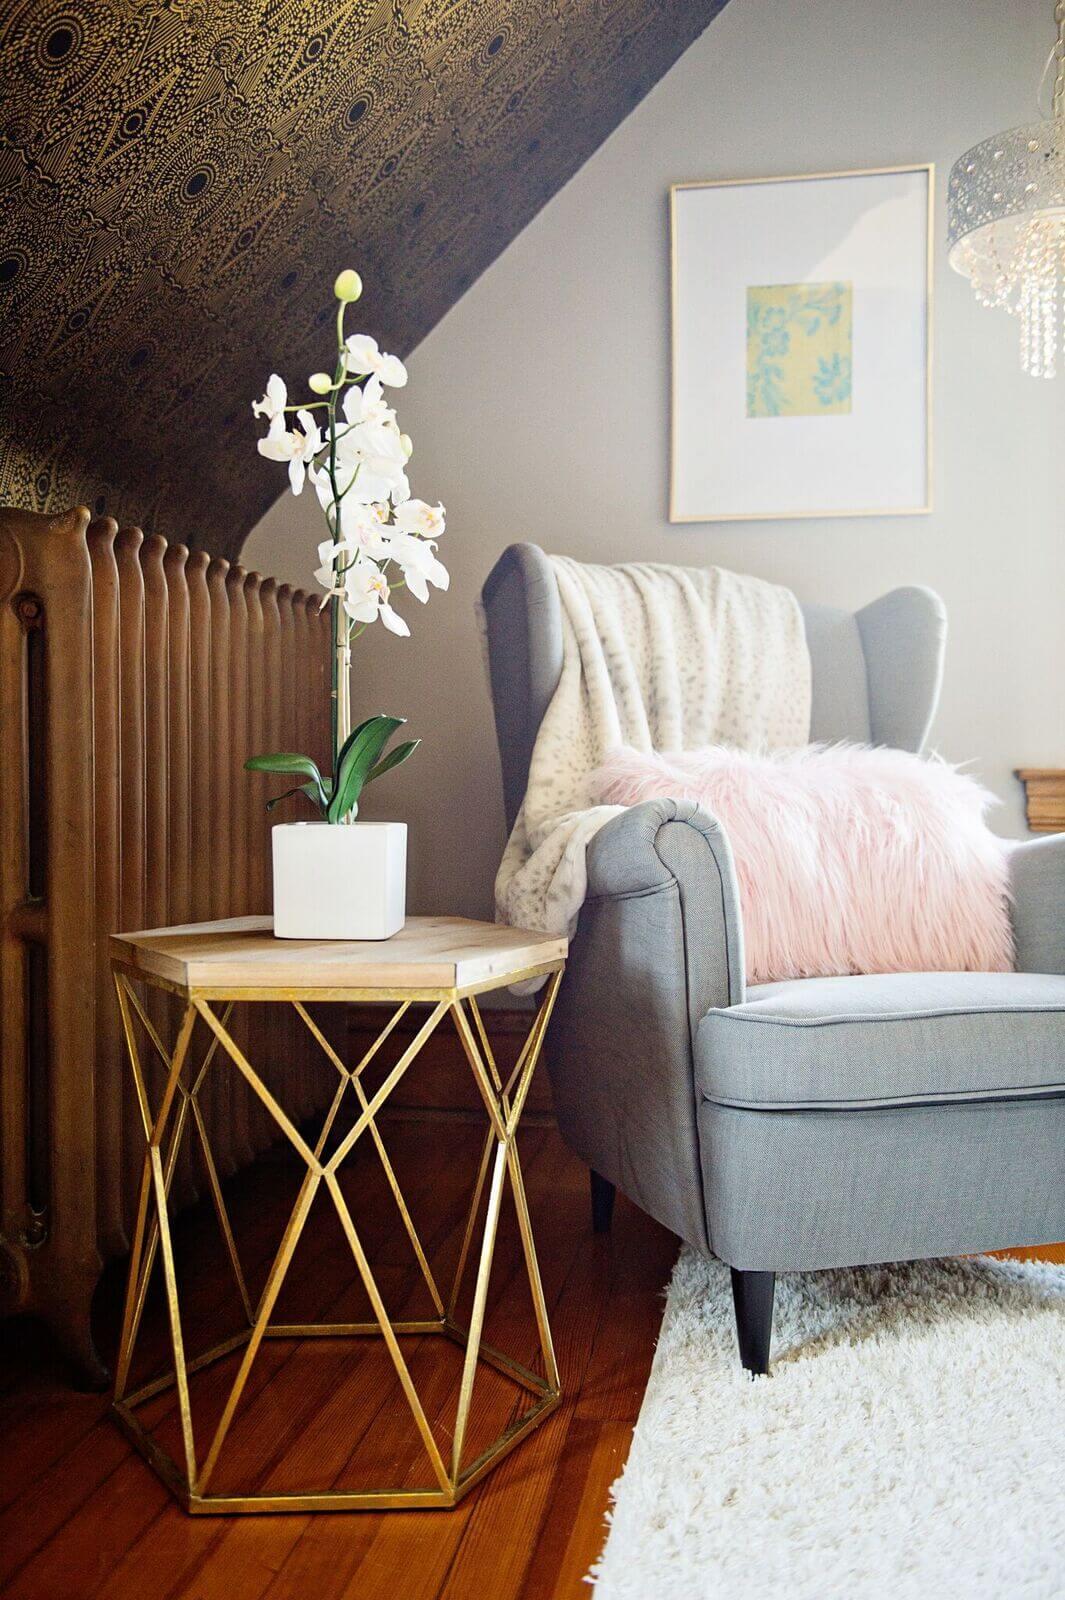 interior-design-bedroom-decor-kids-guest-room-elegant-philadelphia-pa-6.jpeg